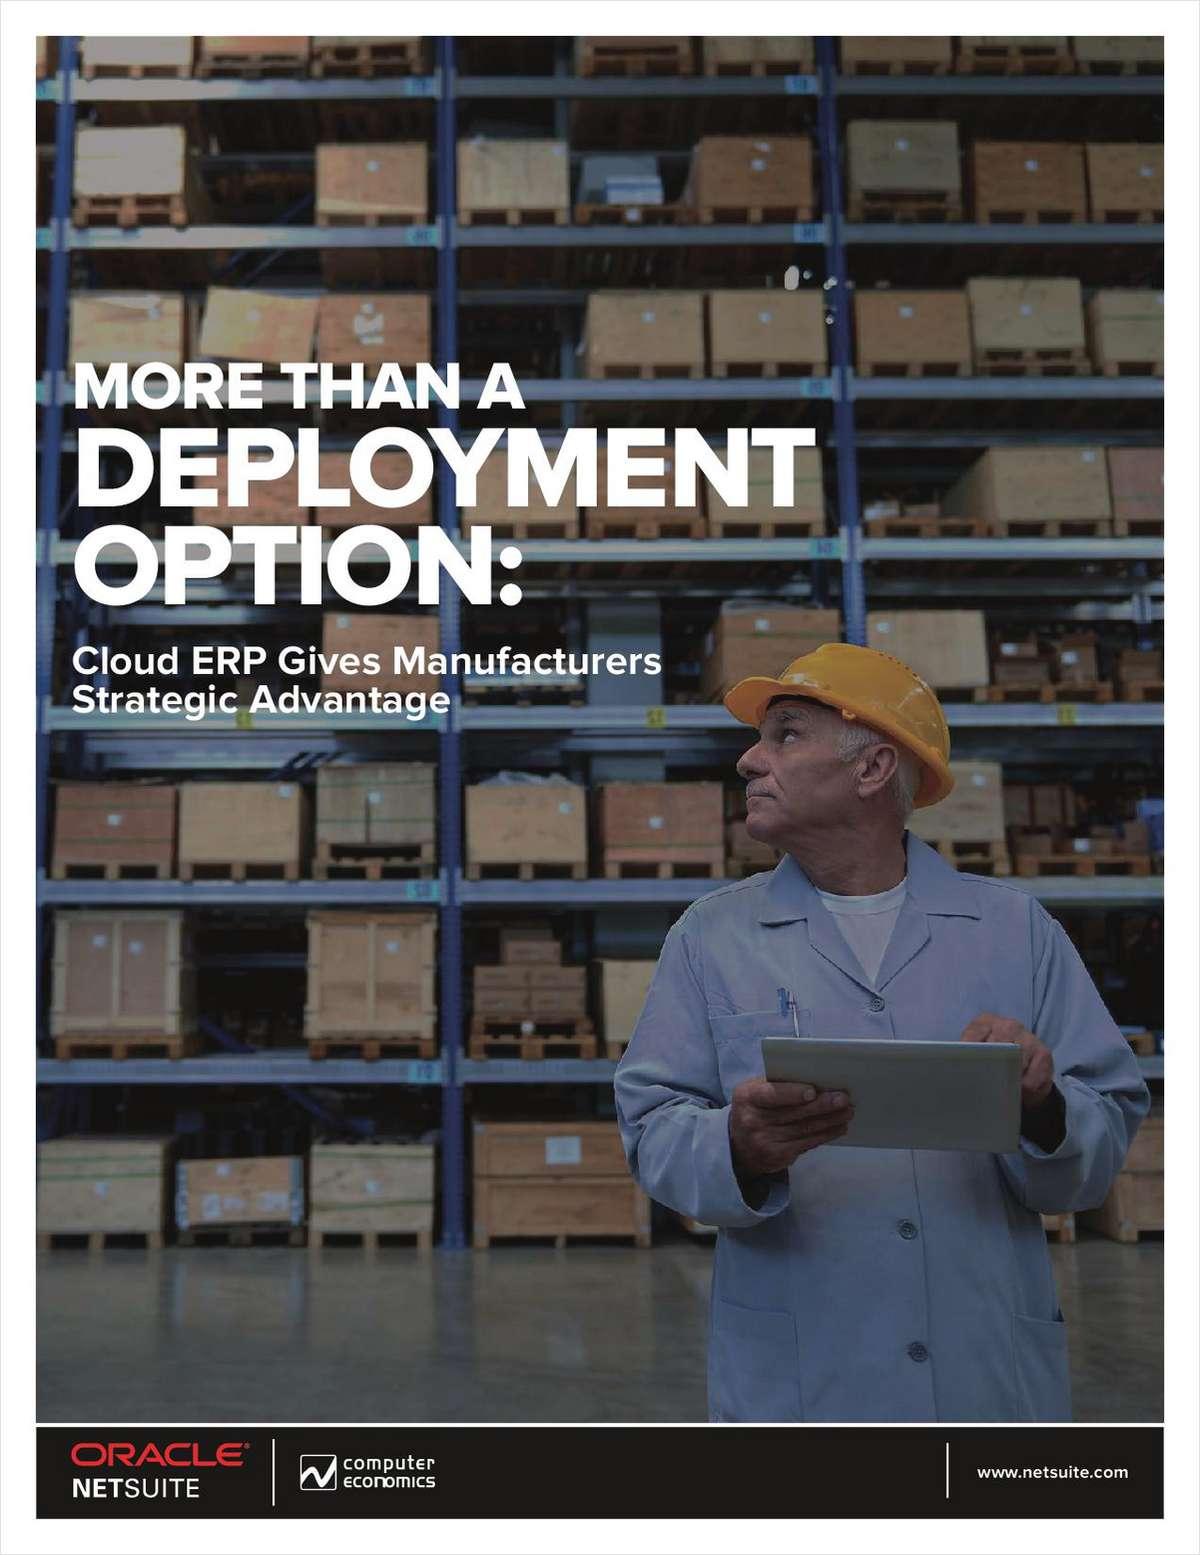 More Than a Deployment Option: Cloud ERP Gives Manufacturers Strategic Advantage